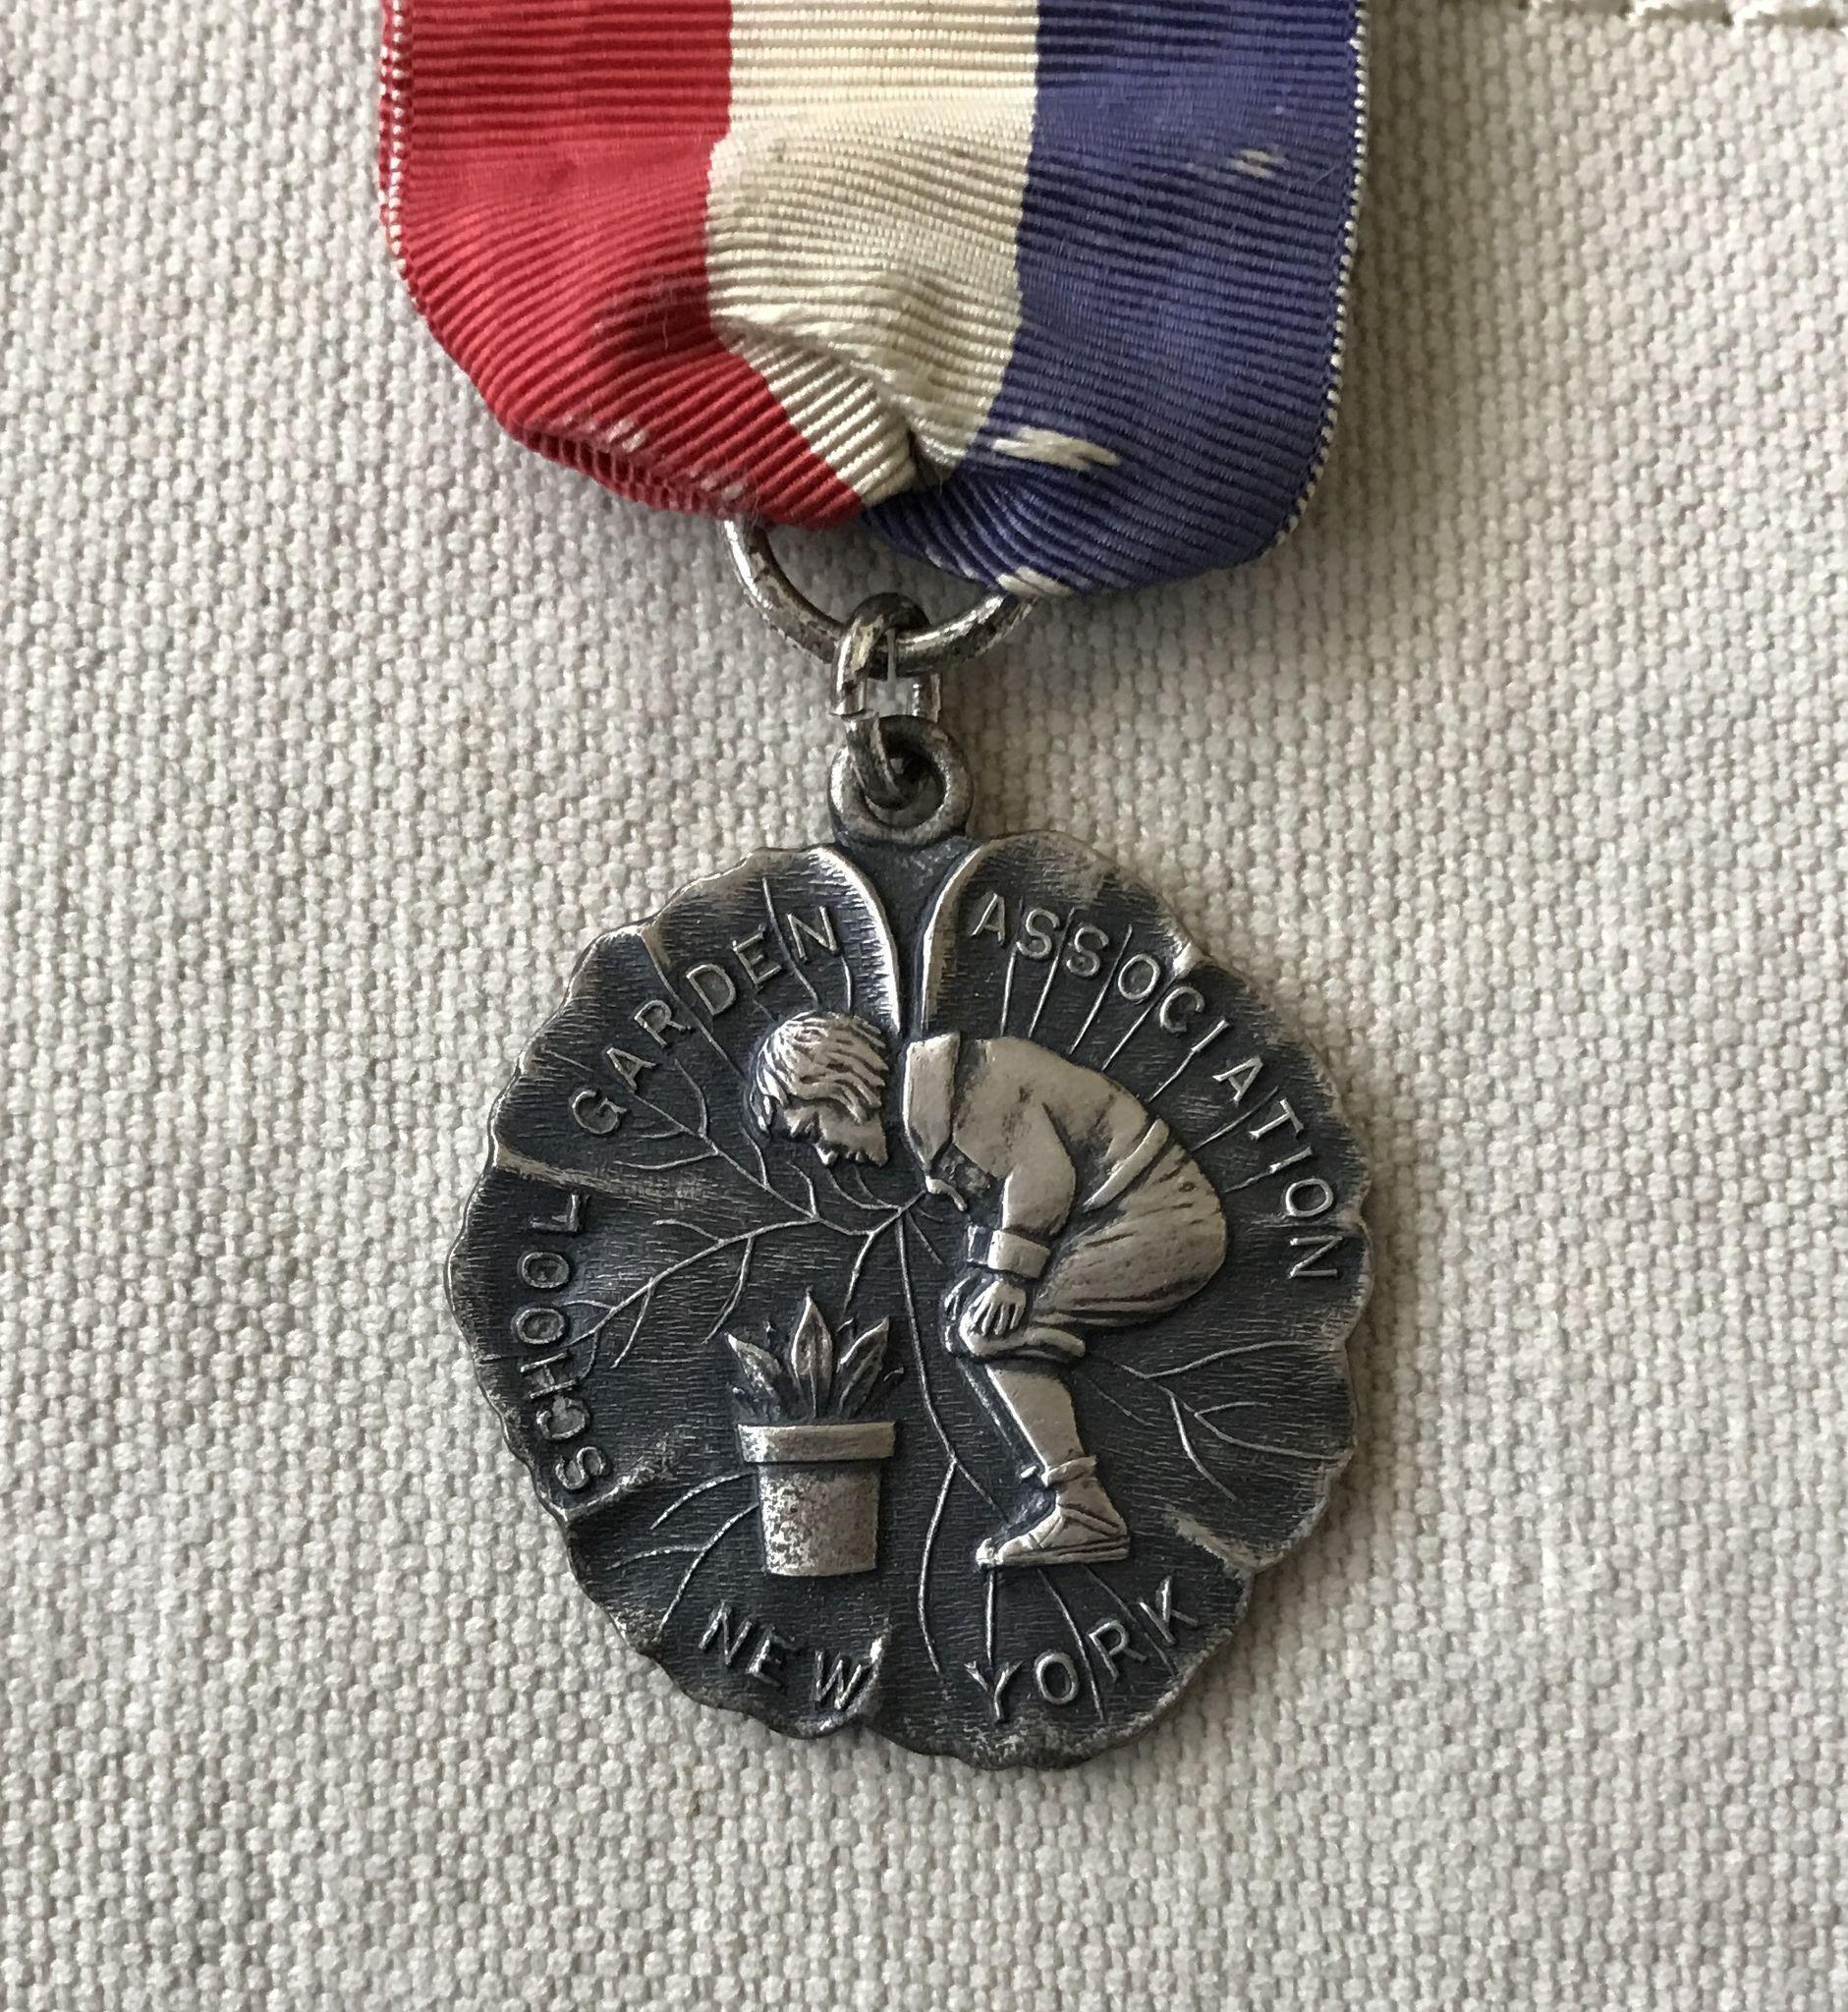 Charming Old Sterling Silver New York School Garden Association Medal & Ribbon